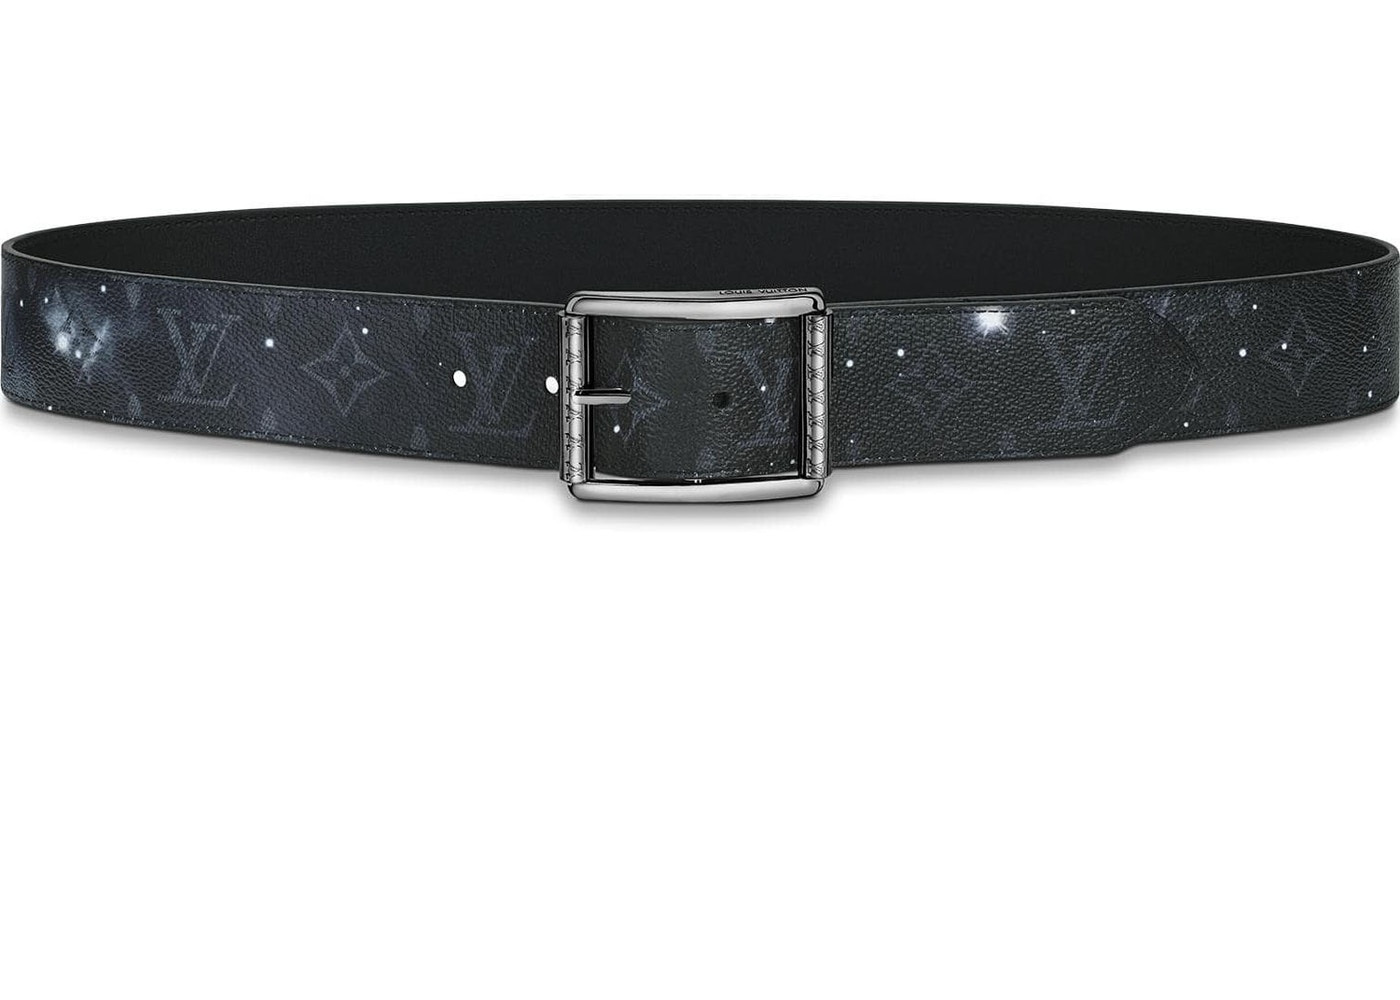 9a216a594029 Louis Vuitton Belt Reverso Reversible Monogram Galaxy 40mm Black  Multicolor. Monogram Galaxy 40mm Black Multicolor